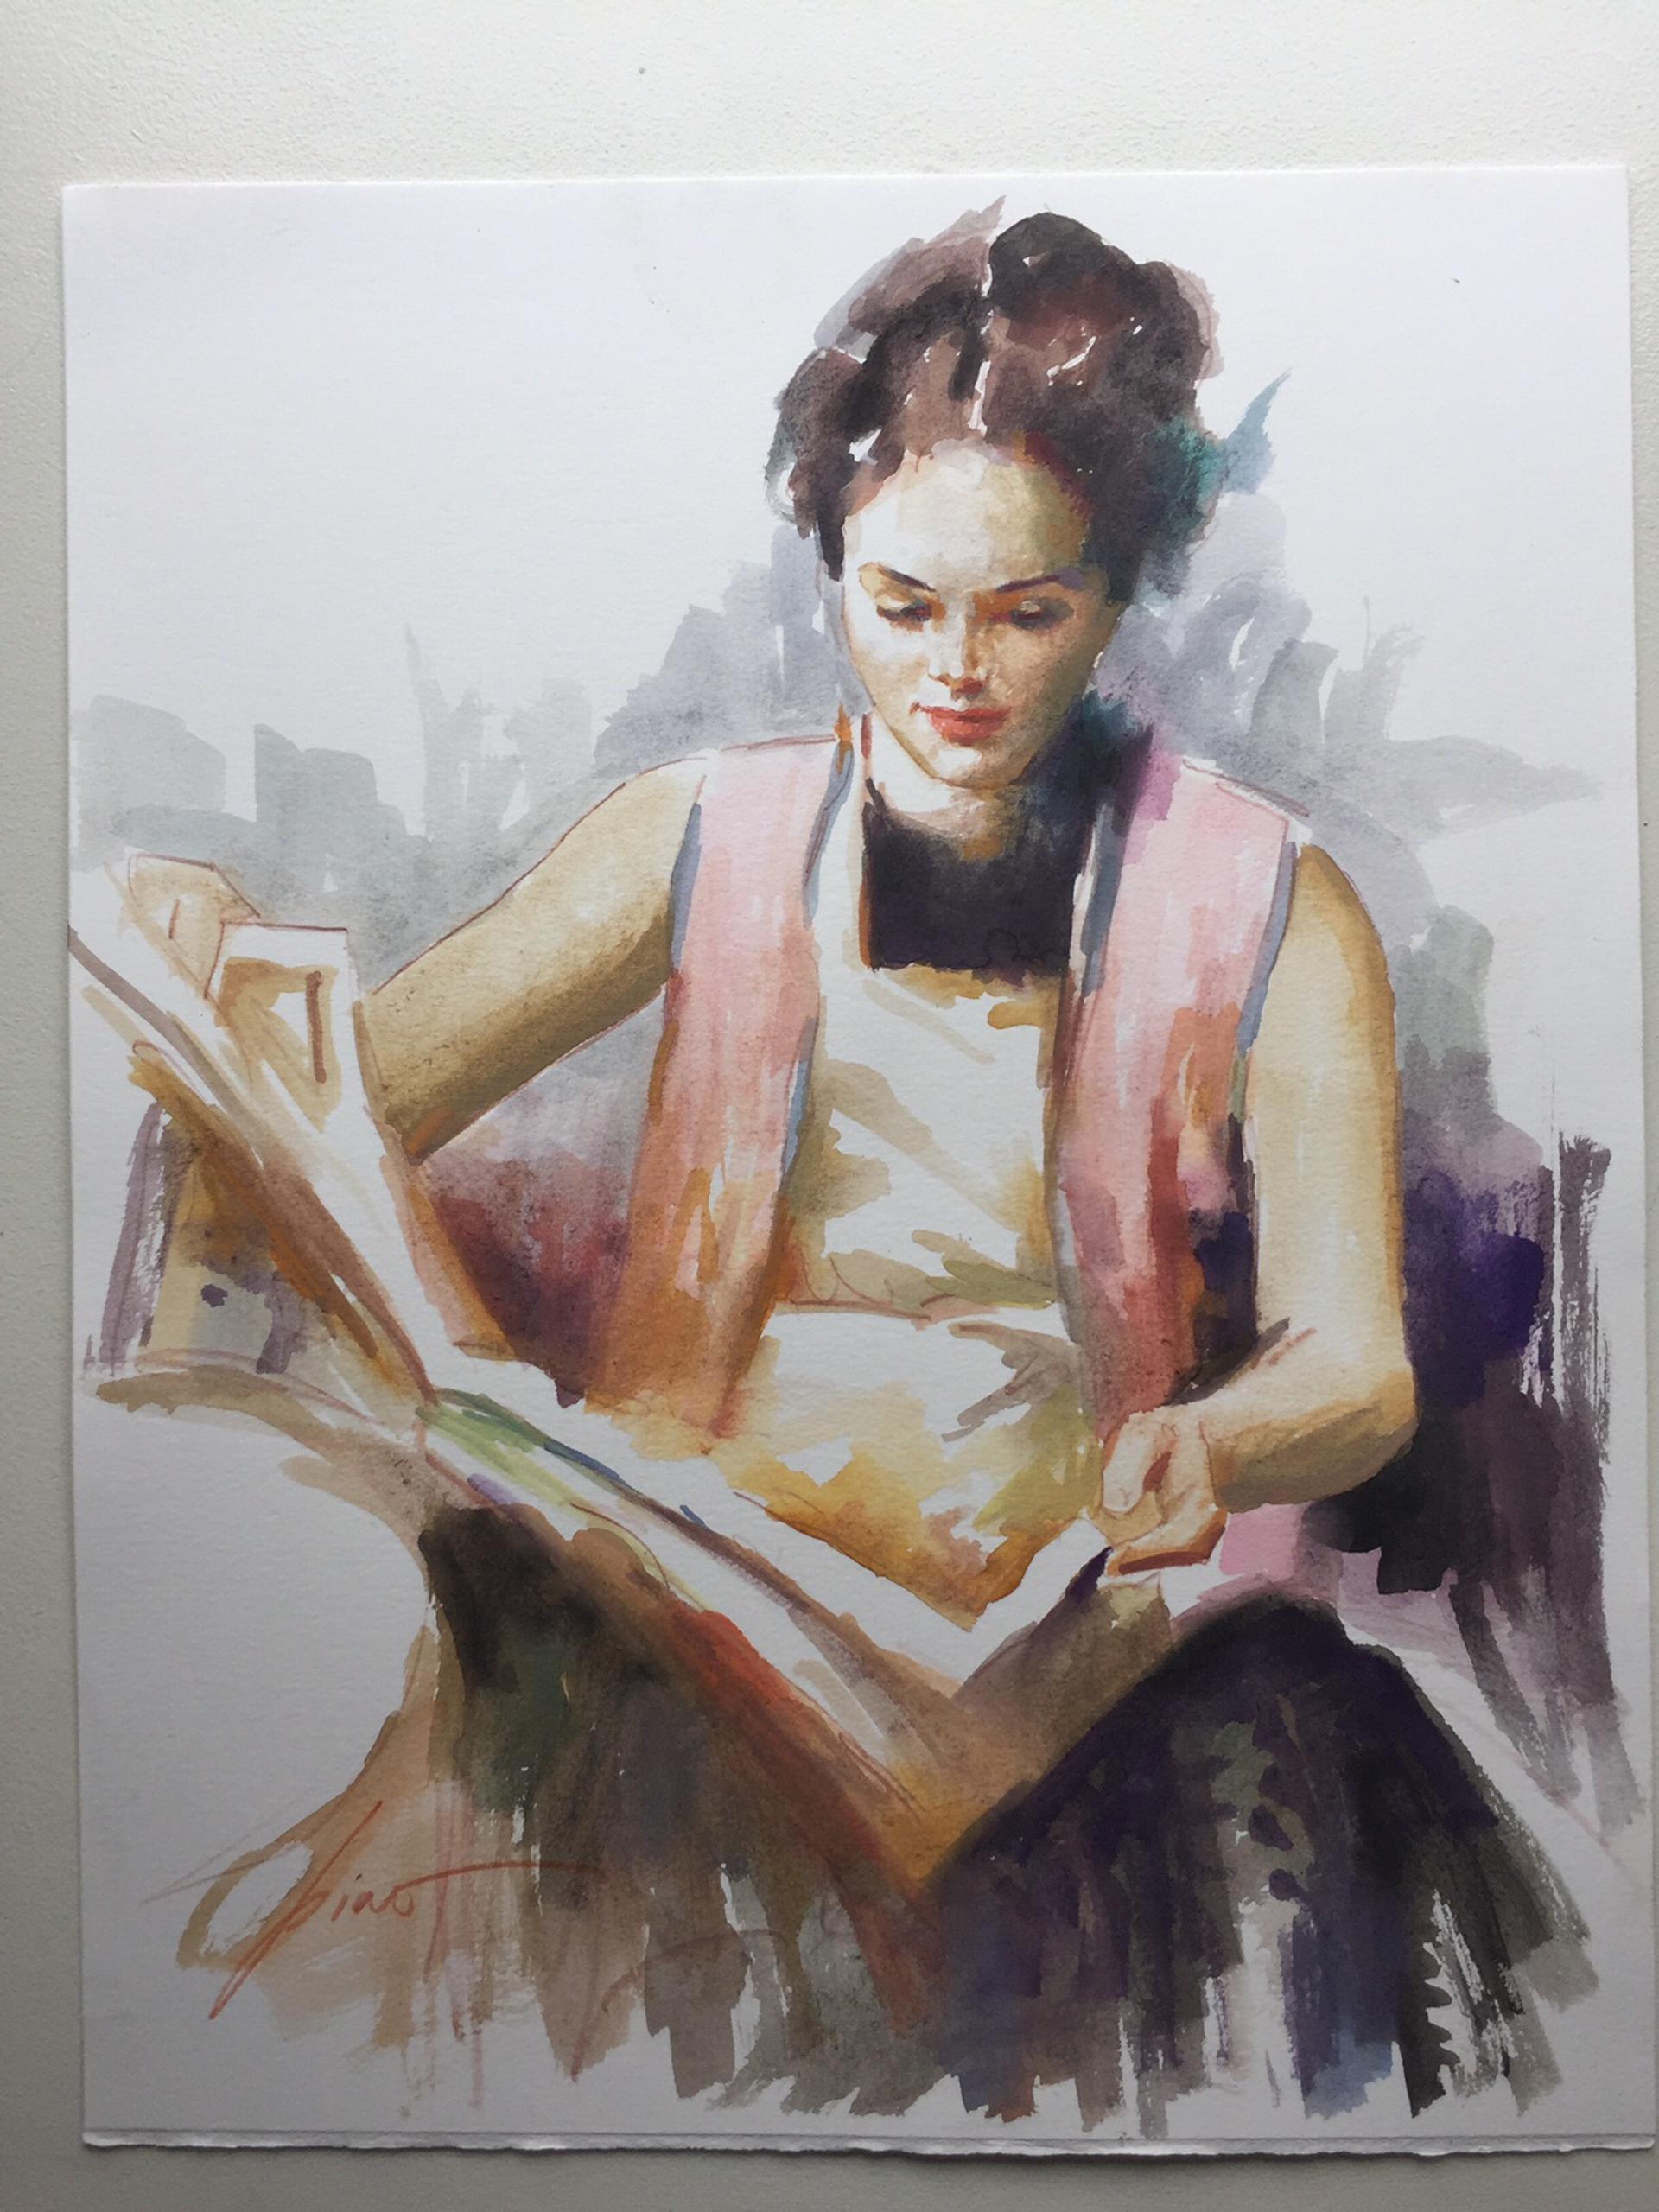 Original Watercolor Release 9 by Pino